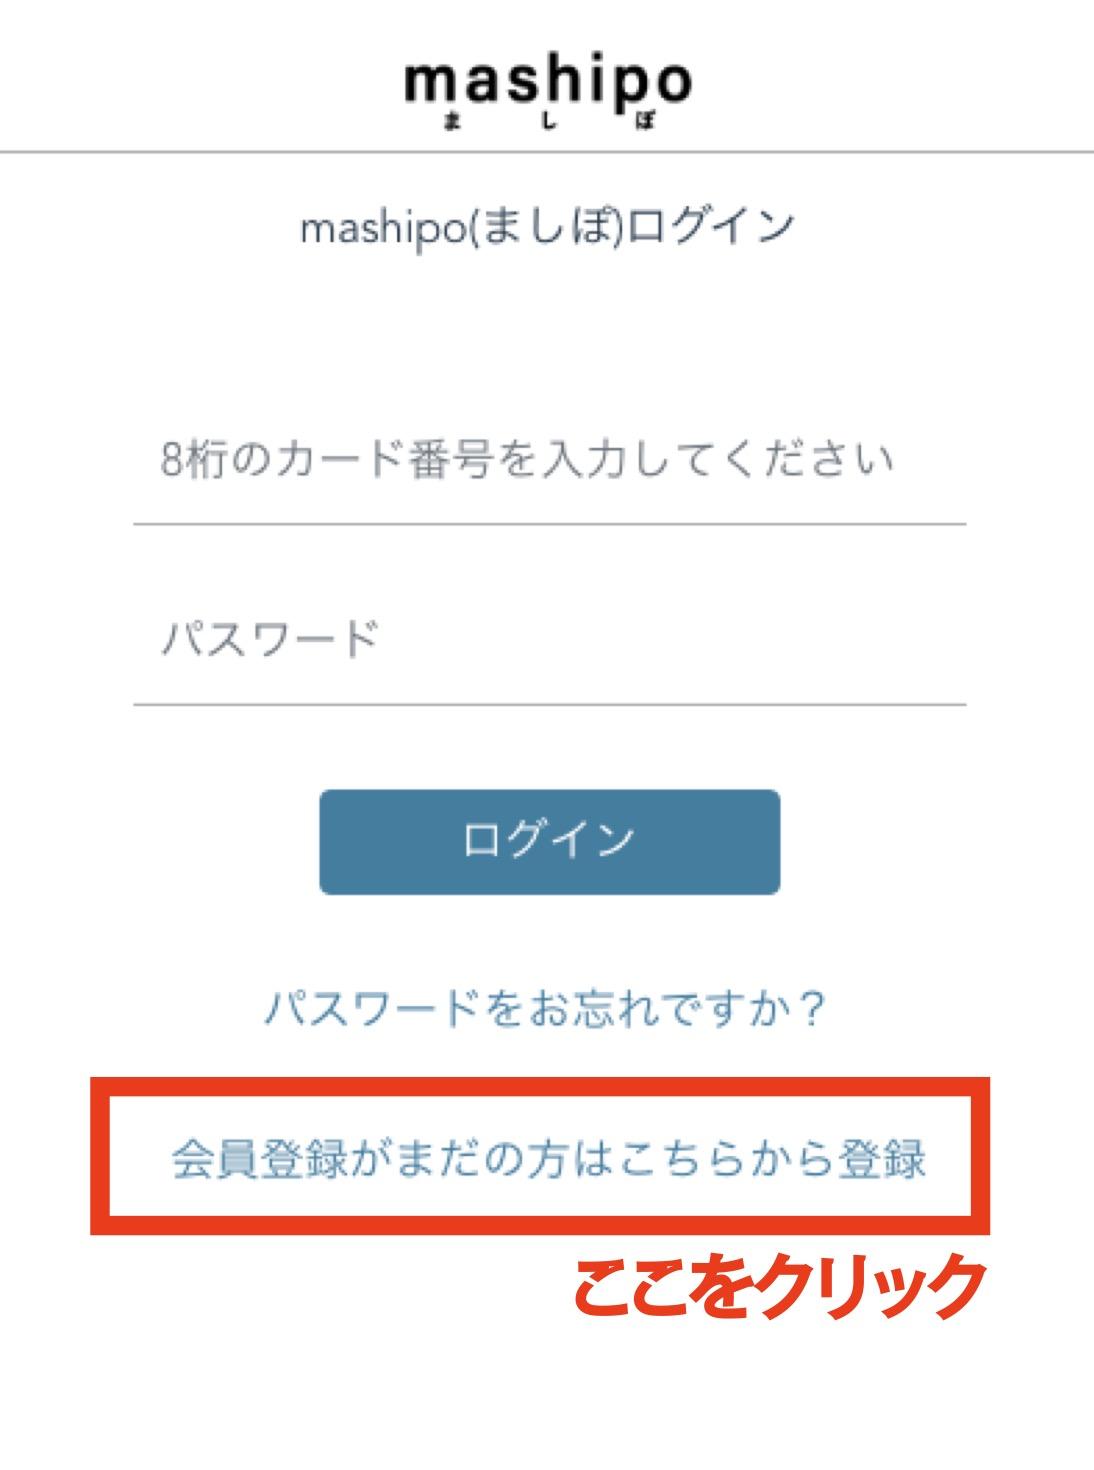 mashipo会員情報Web登録トップ画面